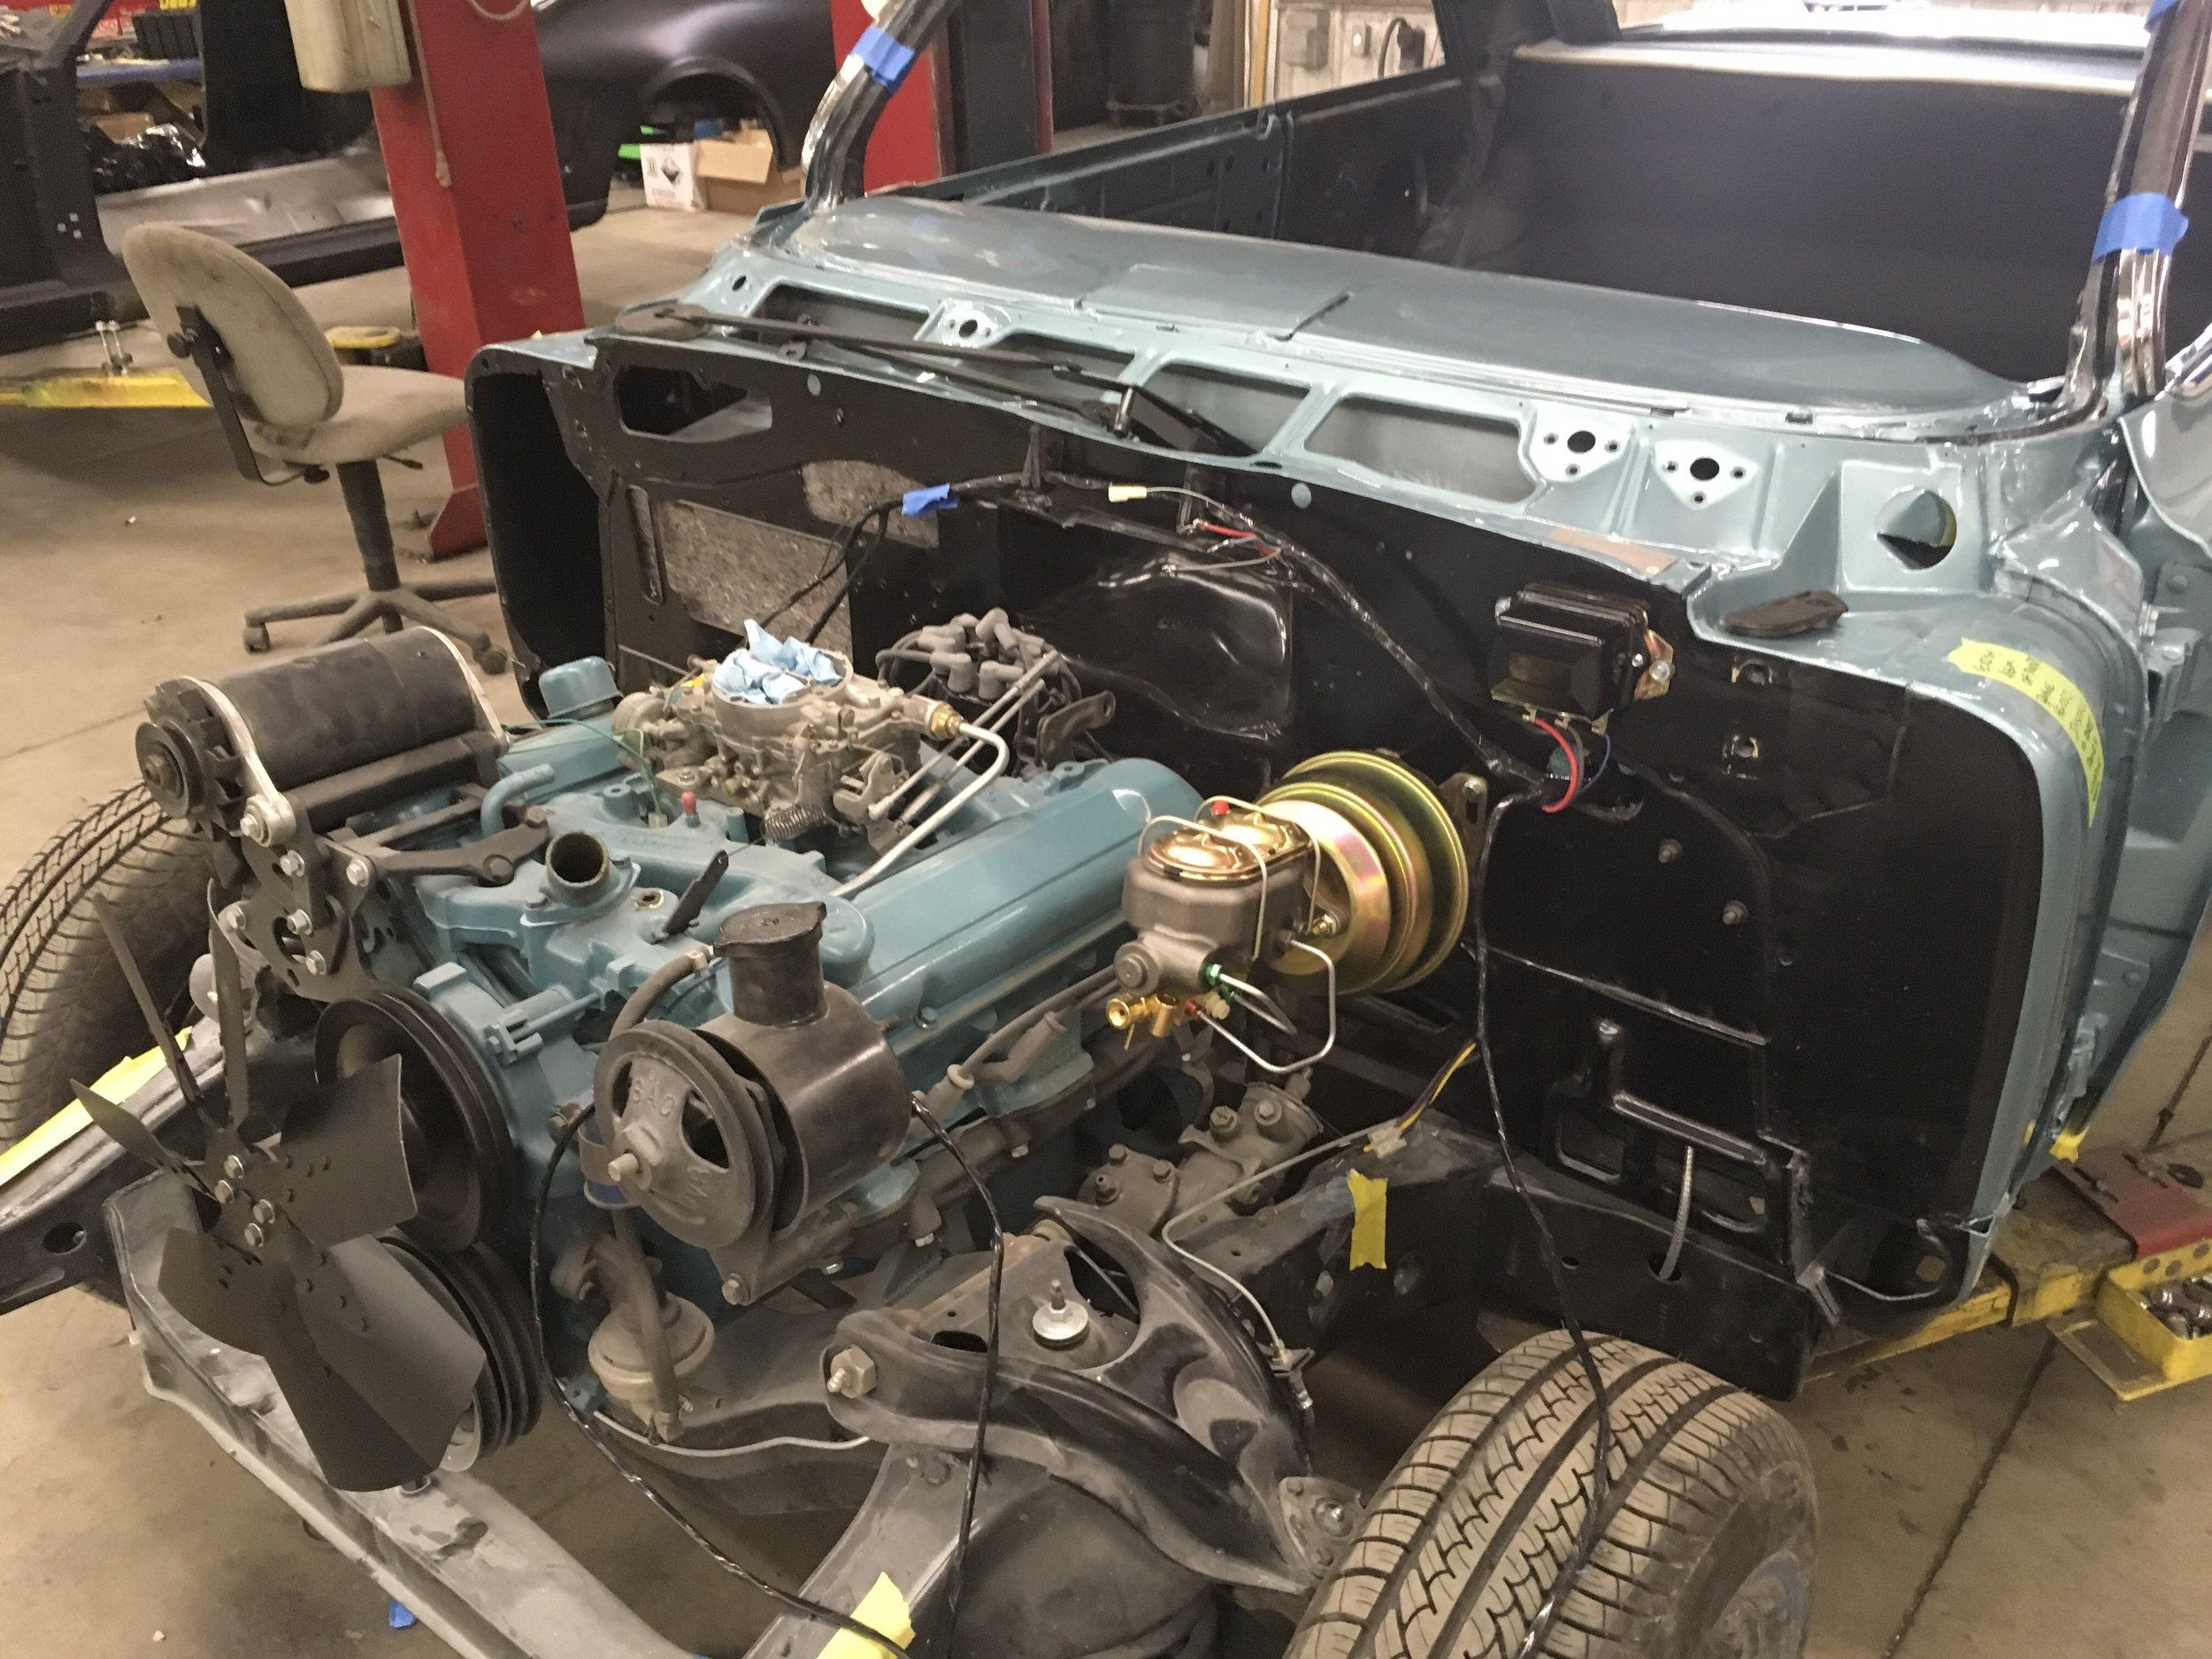 1962-pontiac-bonneville-minneapolis-hot-rod-custom-build-restoration-34.jpg